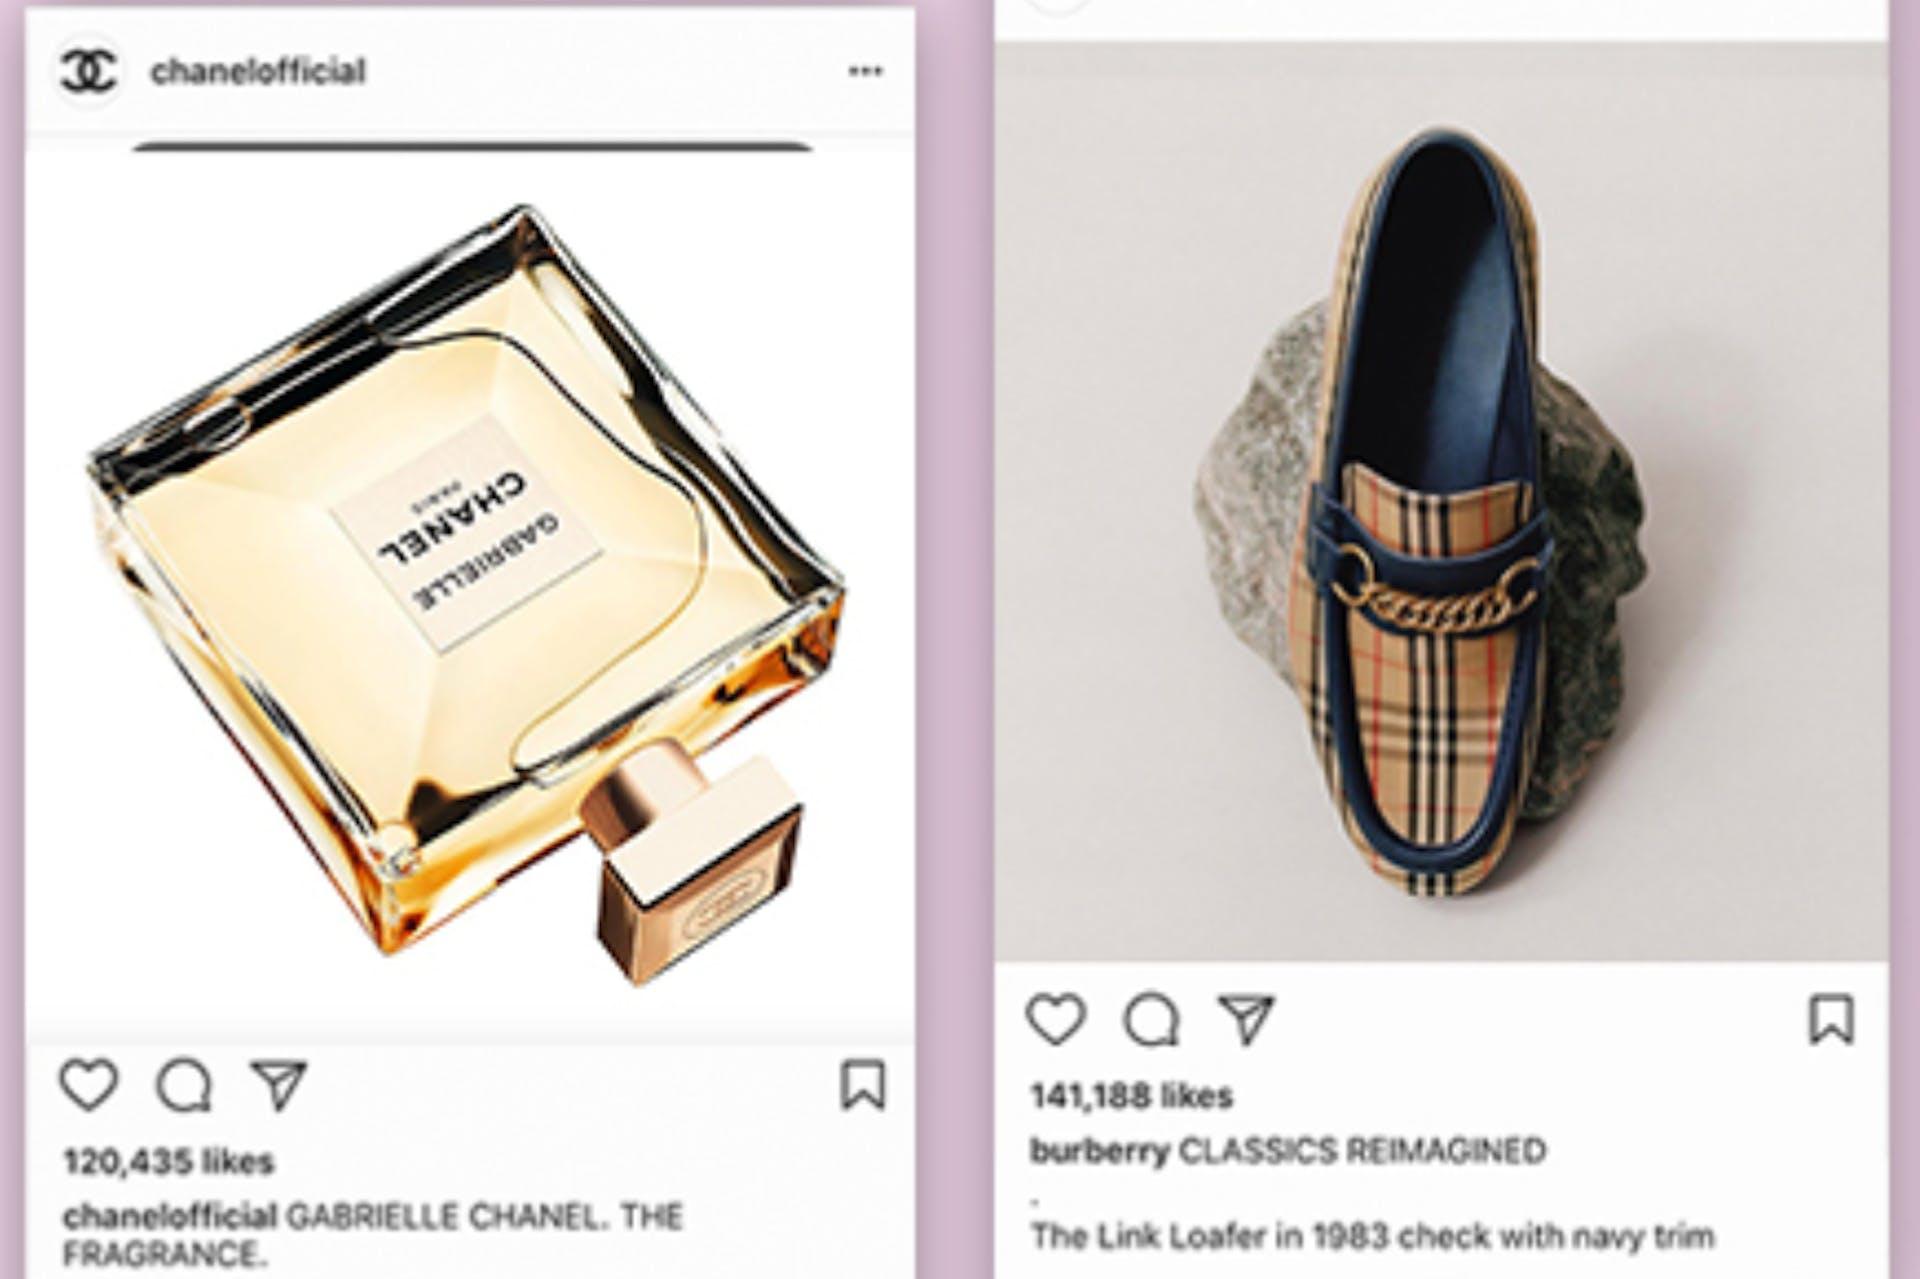 5 fashion brands using social media